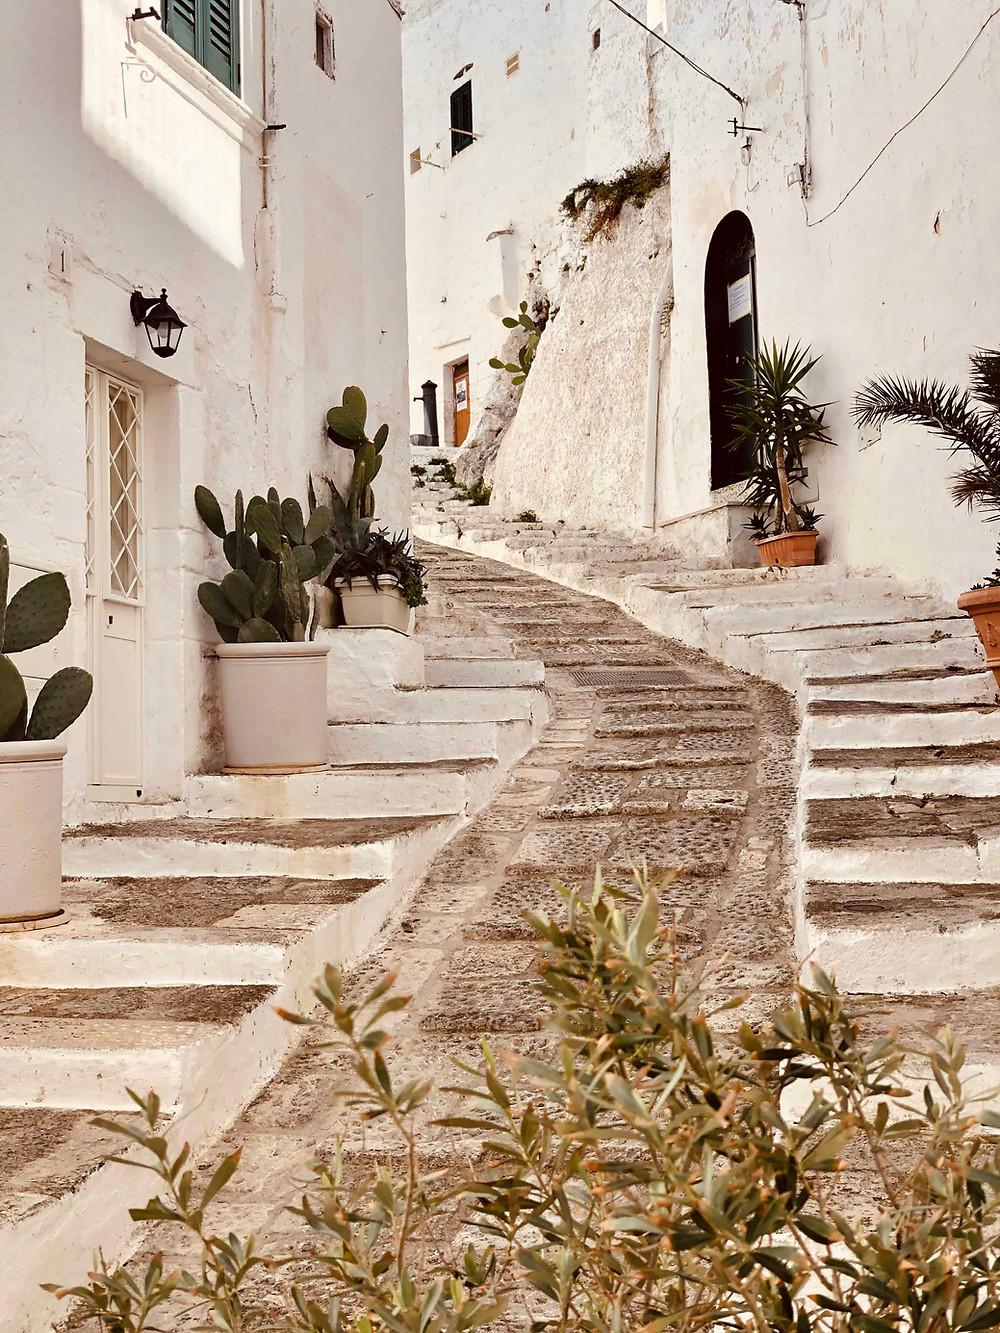 Alleys of Ostuni Puglia-Italy